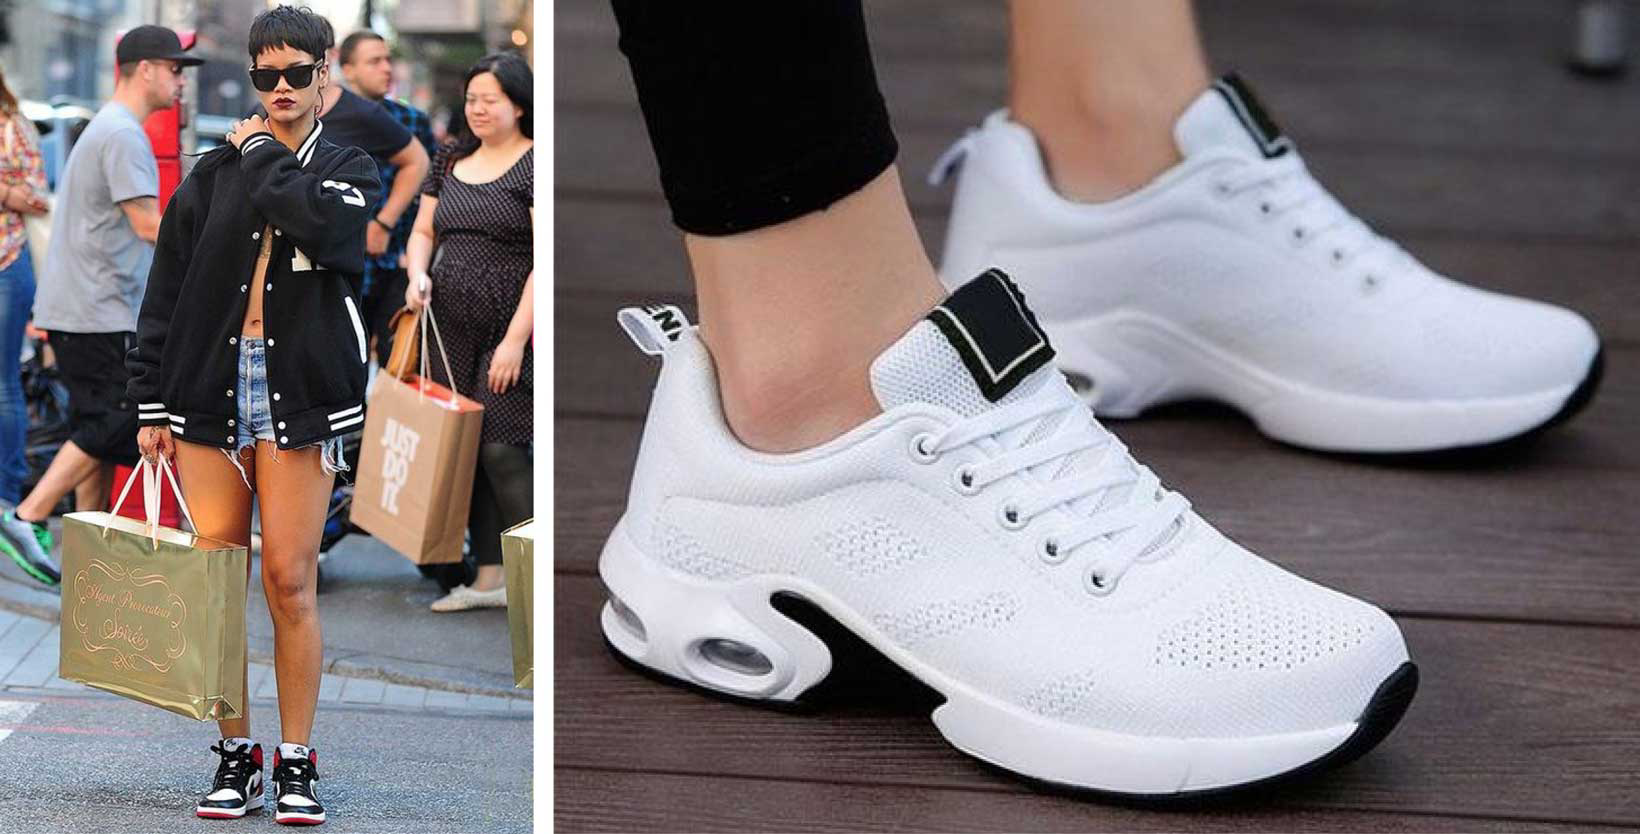 Sneakers - 2010s women shoes